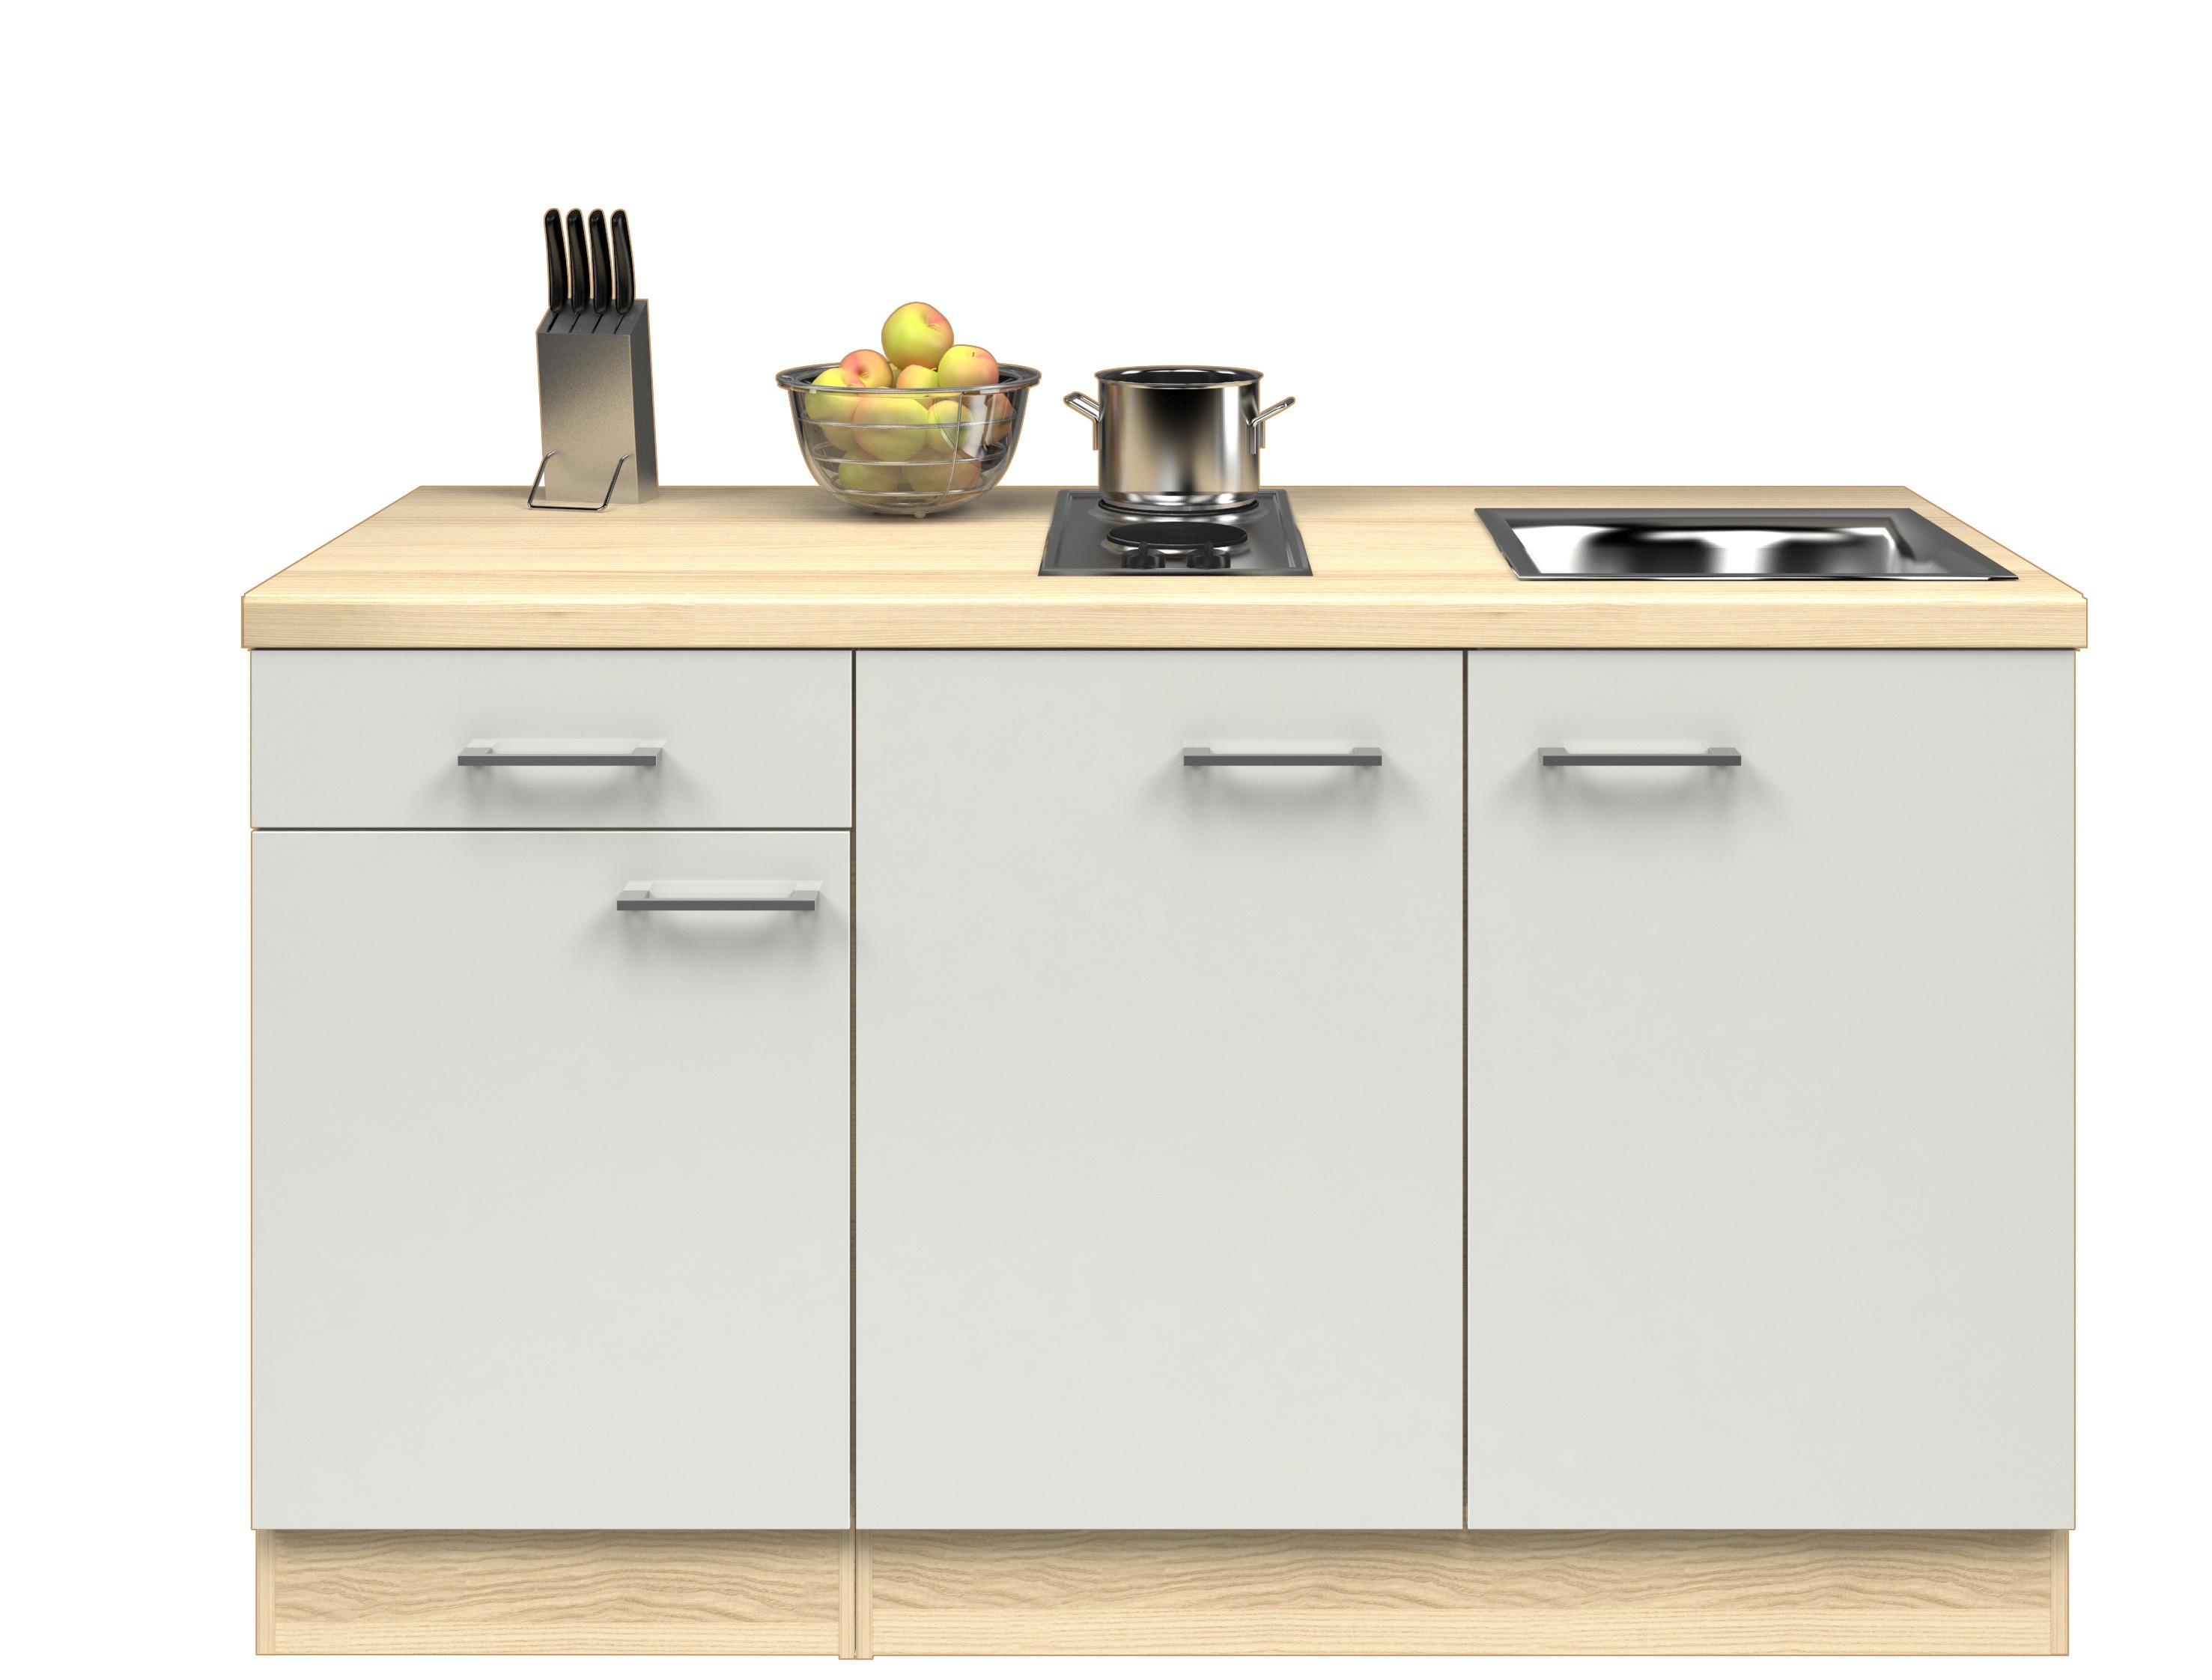 singlek che florenz breite 150 cm perlmutt wei k che singlek chen. Black Bedroom Furniture Sets. Home Design Ideas